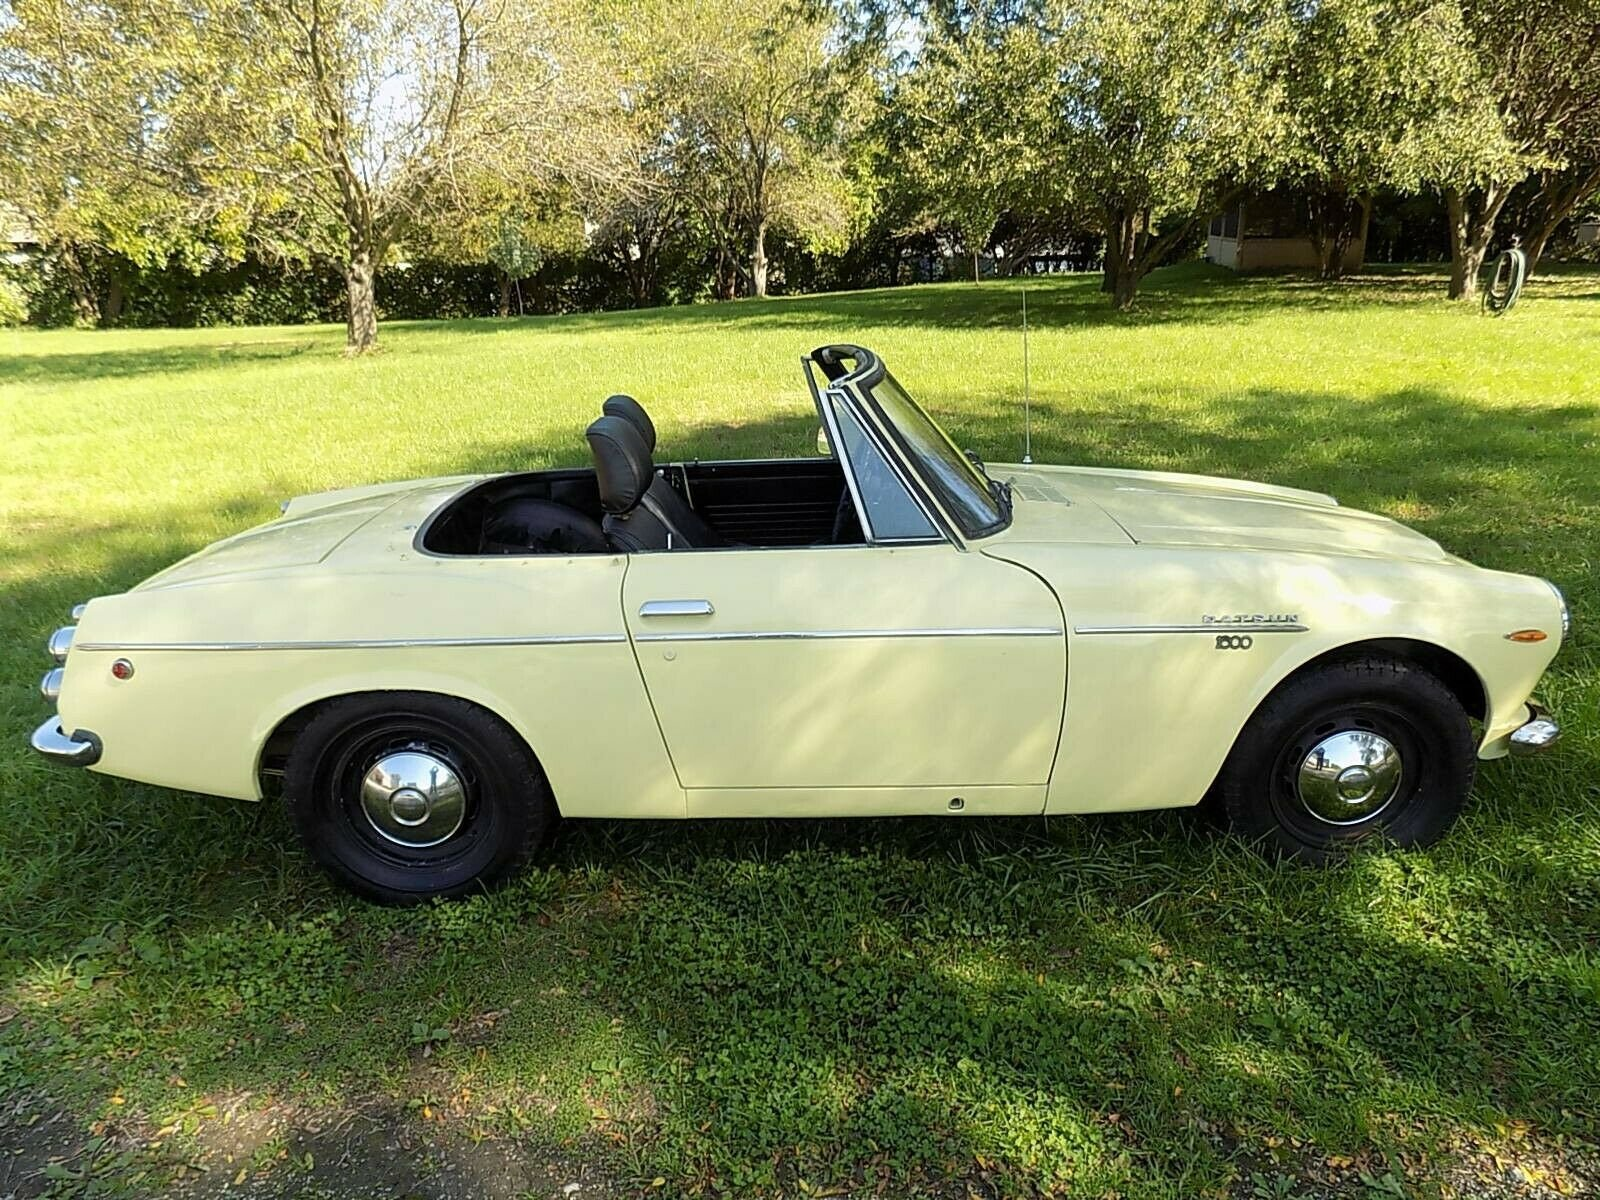 1969 Datsun 1600 Roadster Vintage Car Collector